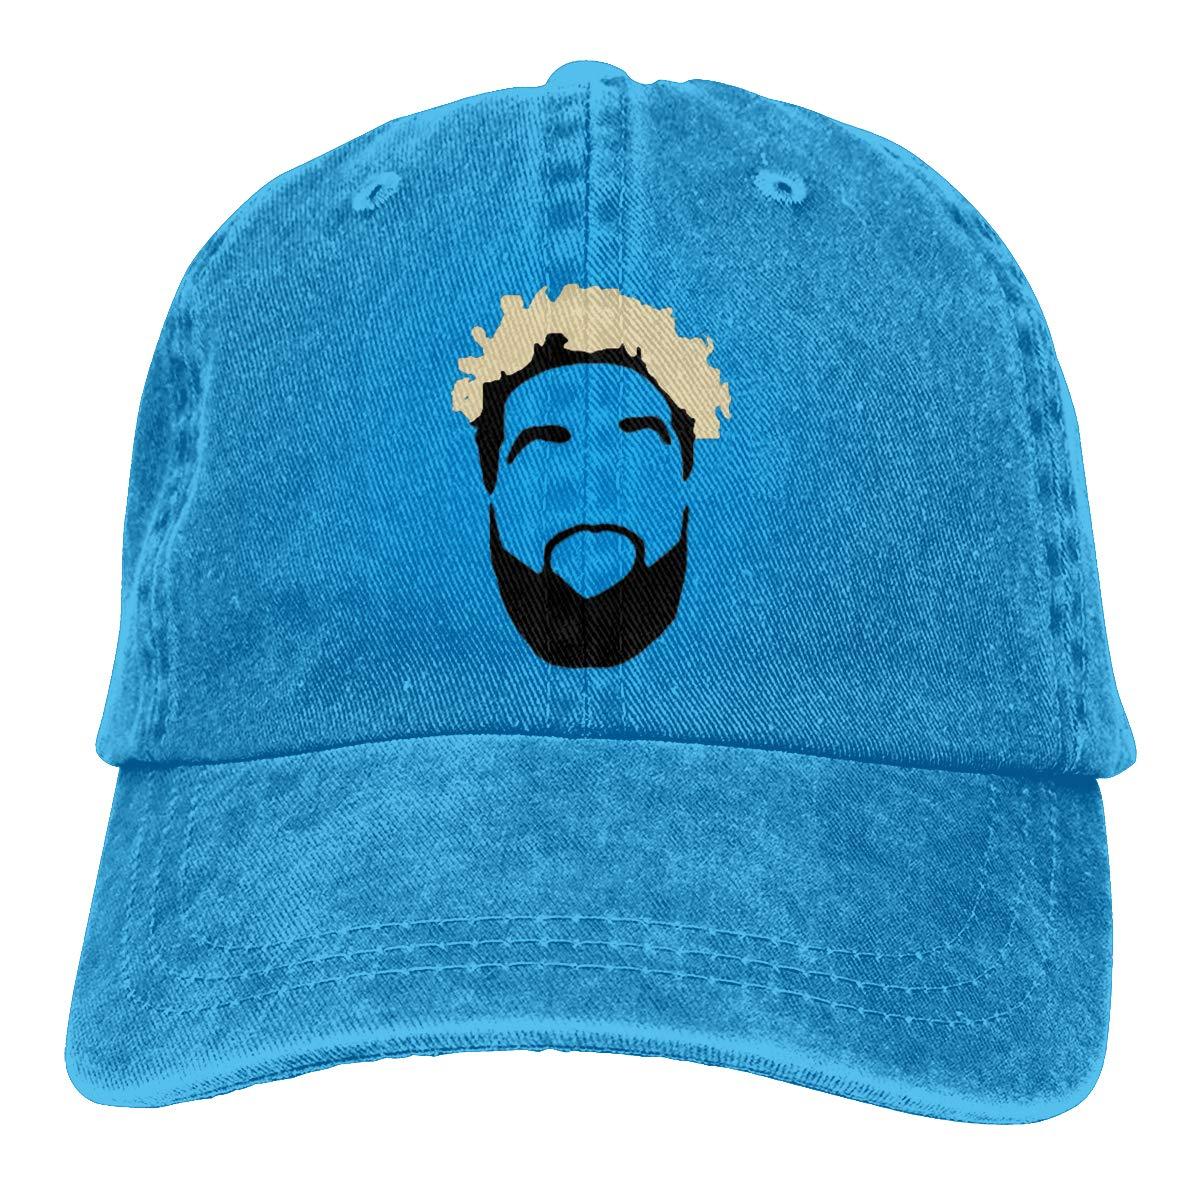 NCEUANCE Cleveland Beckham Face Caps Sports Trucker Caps Pattern Strapback Hat for Men//Women